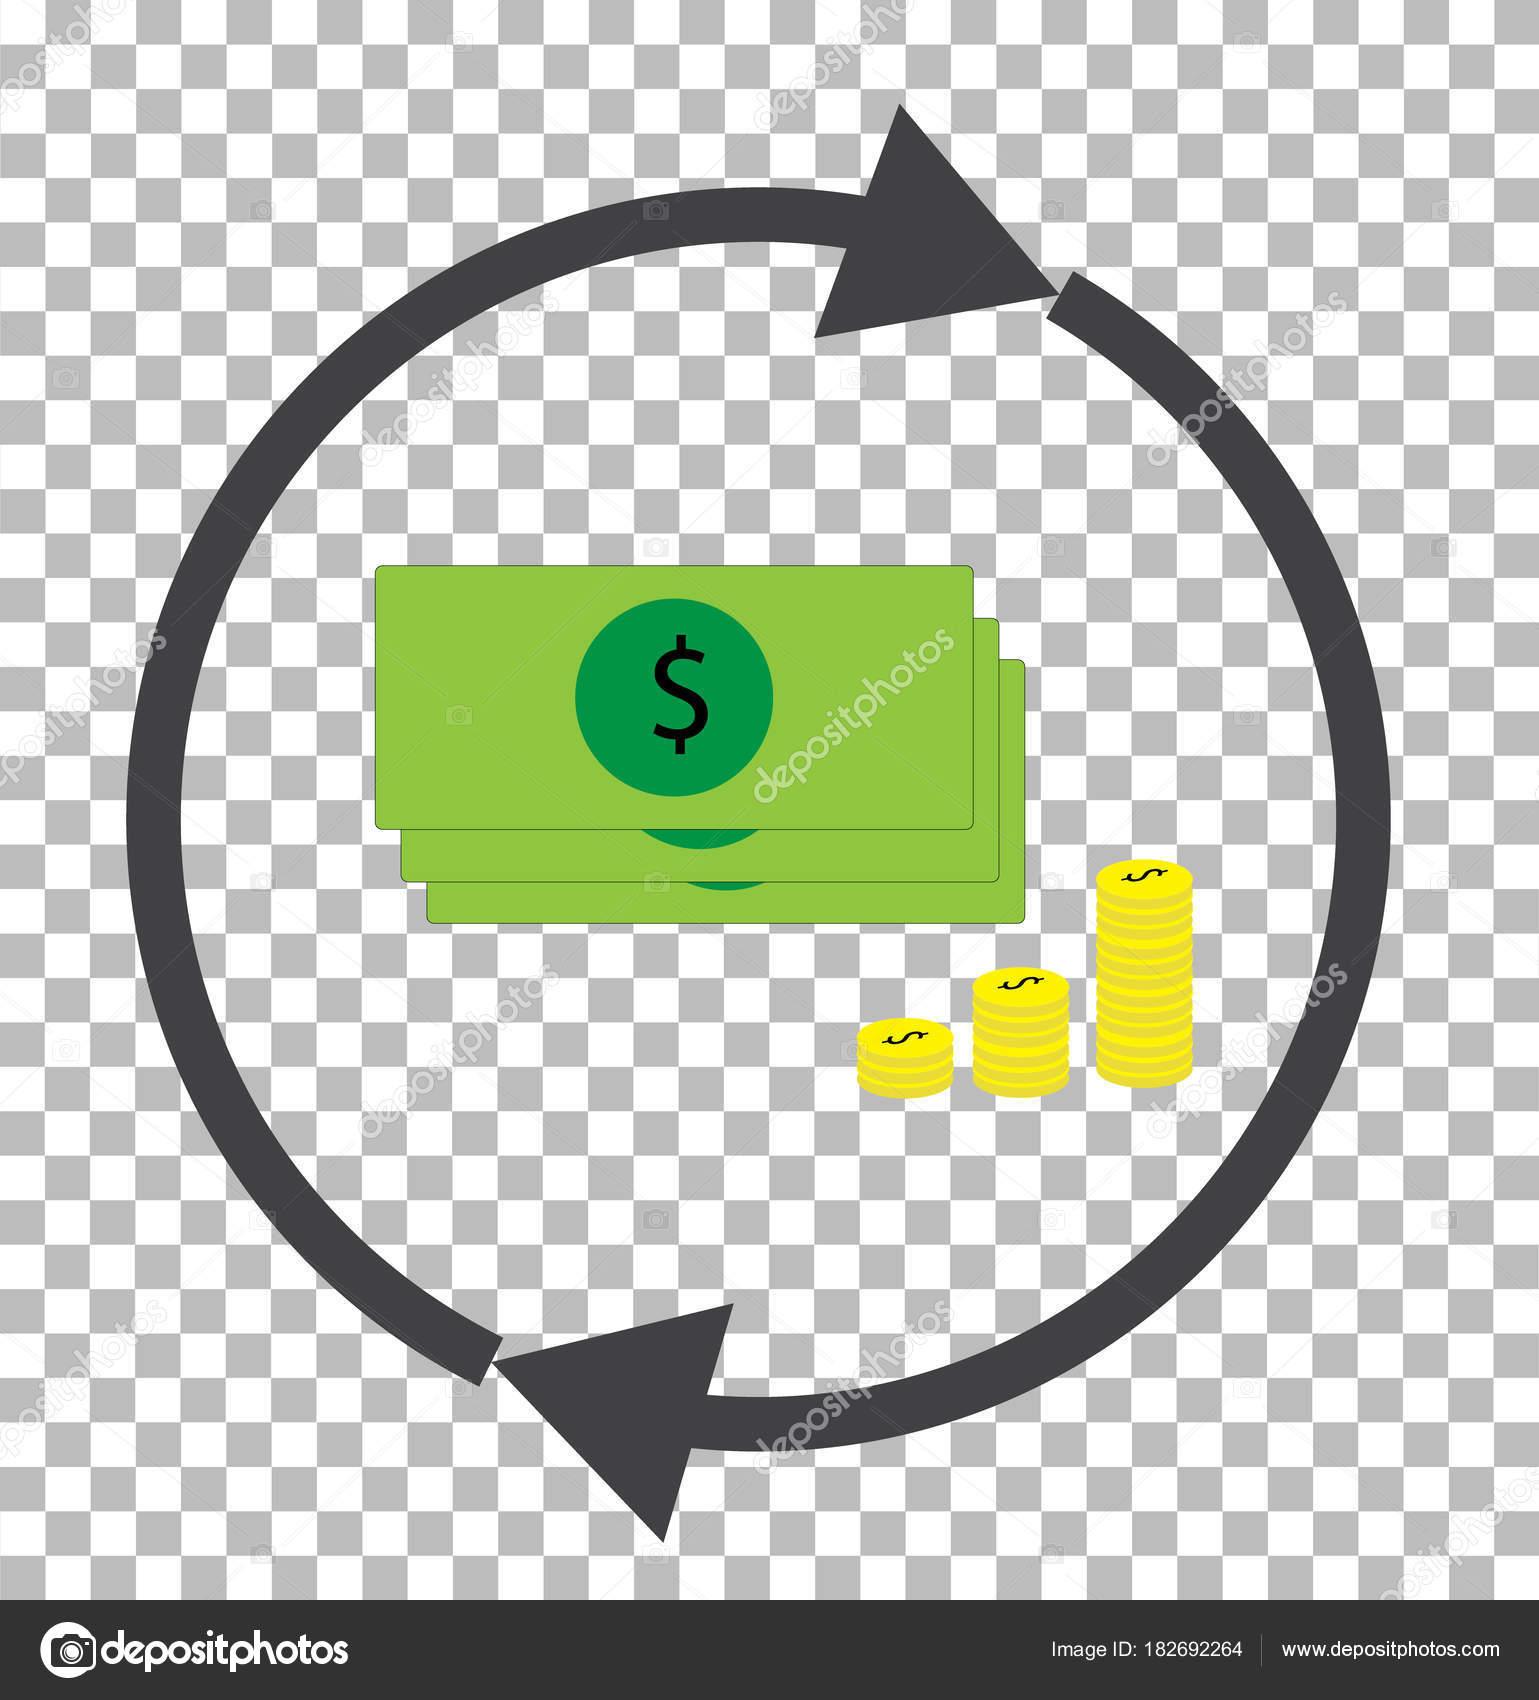 Money convert transparent currency converter icon dollar excha money convert transparent currency converter icon dollar excha stock vector biocorpaavc Gallery